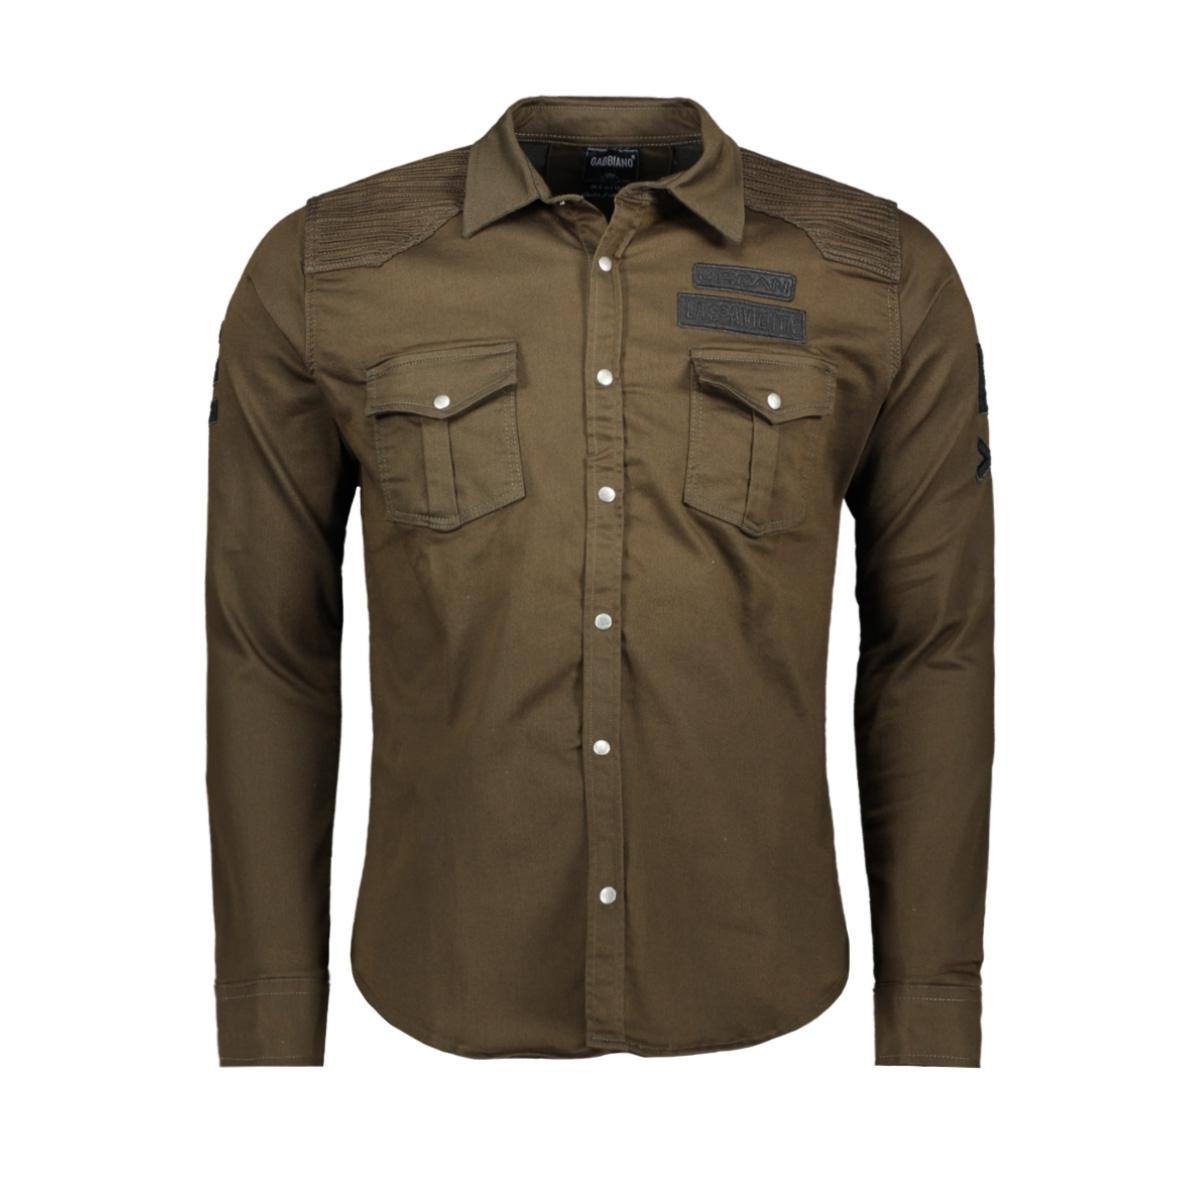 32579 gabbiano overhemd bruin